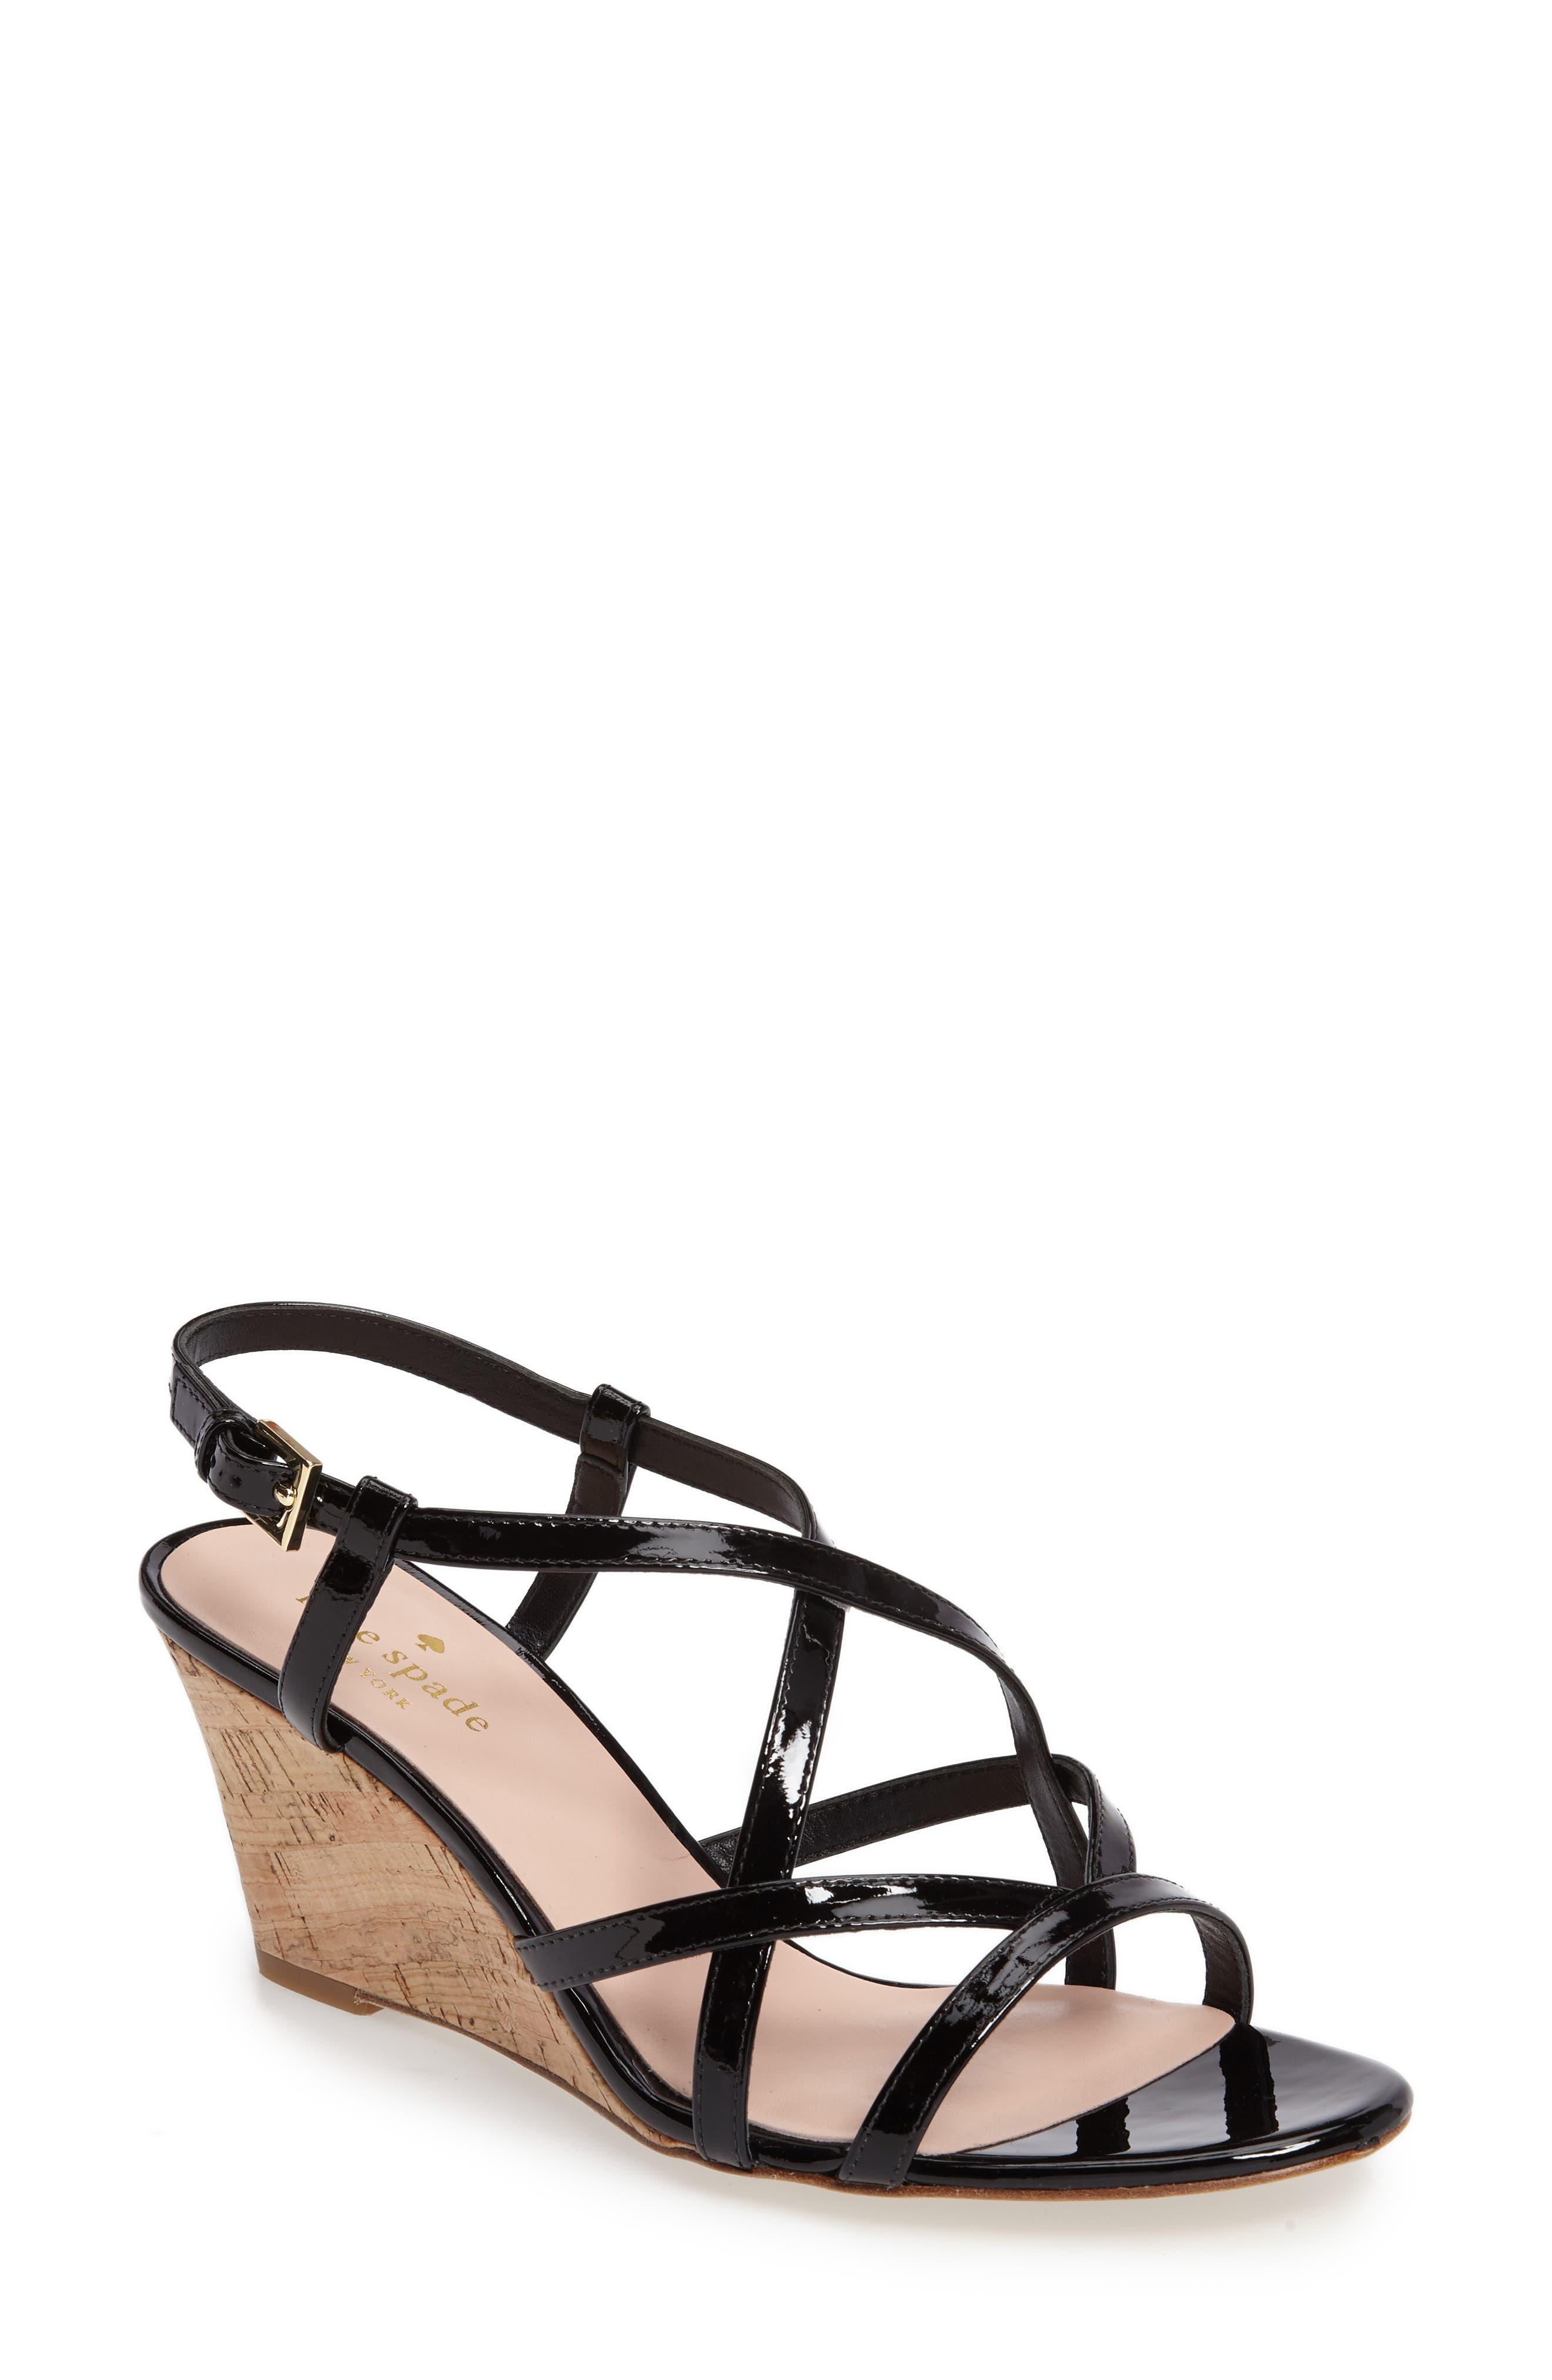 kate spade new york rockaway wedge sandal (Women)